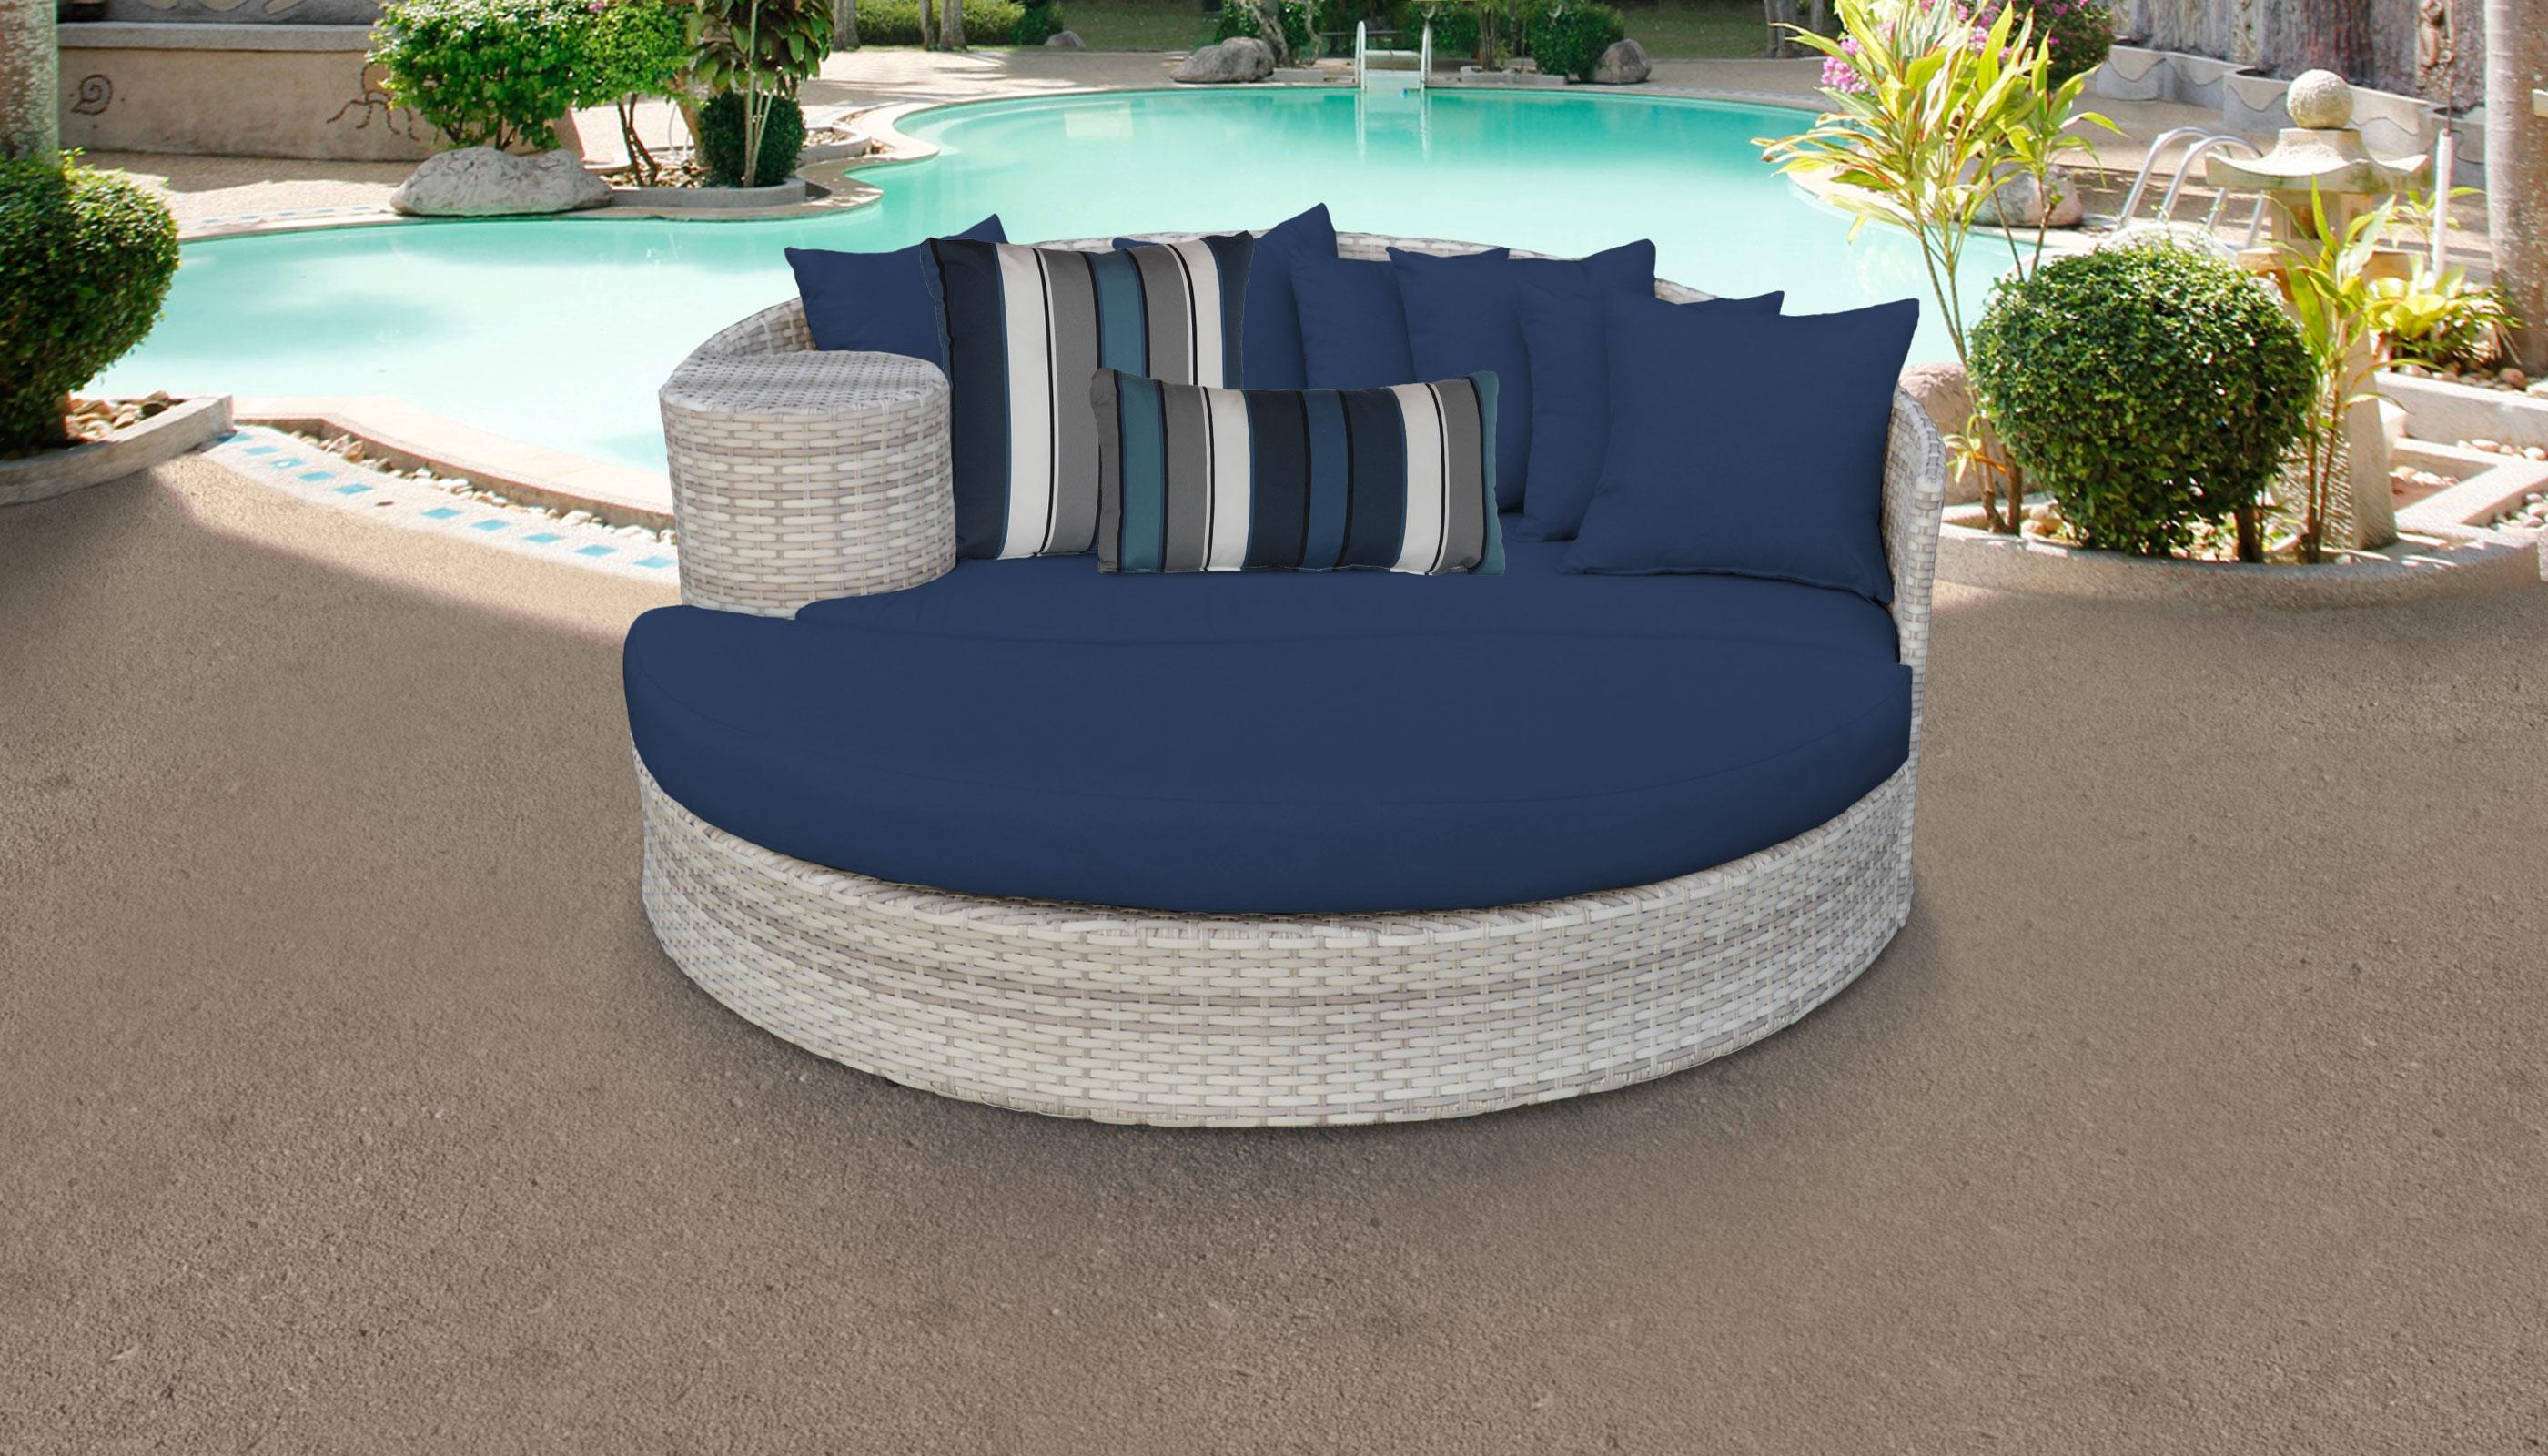 Pleasing Fairmont Circular Sun Bed Outdoor Wicker Patio Furniture Download Free Architecture Designs Embacsunscenecom